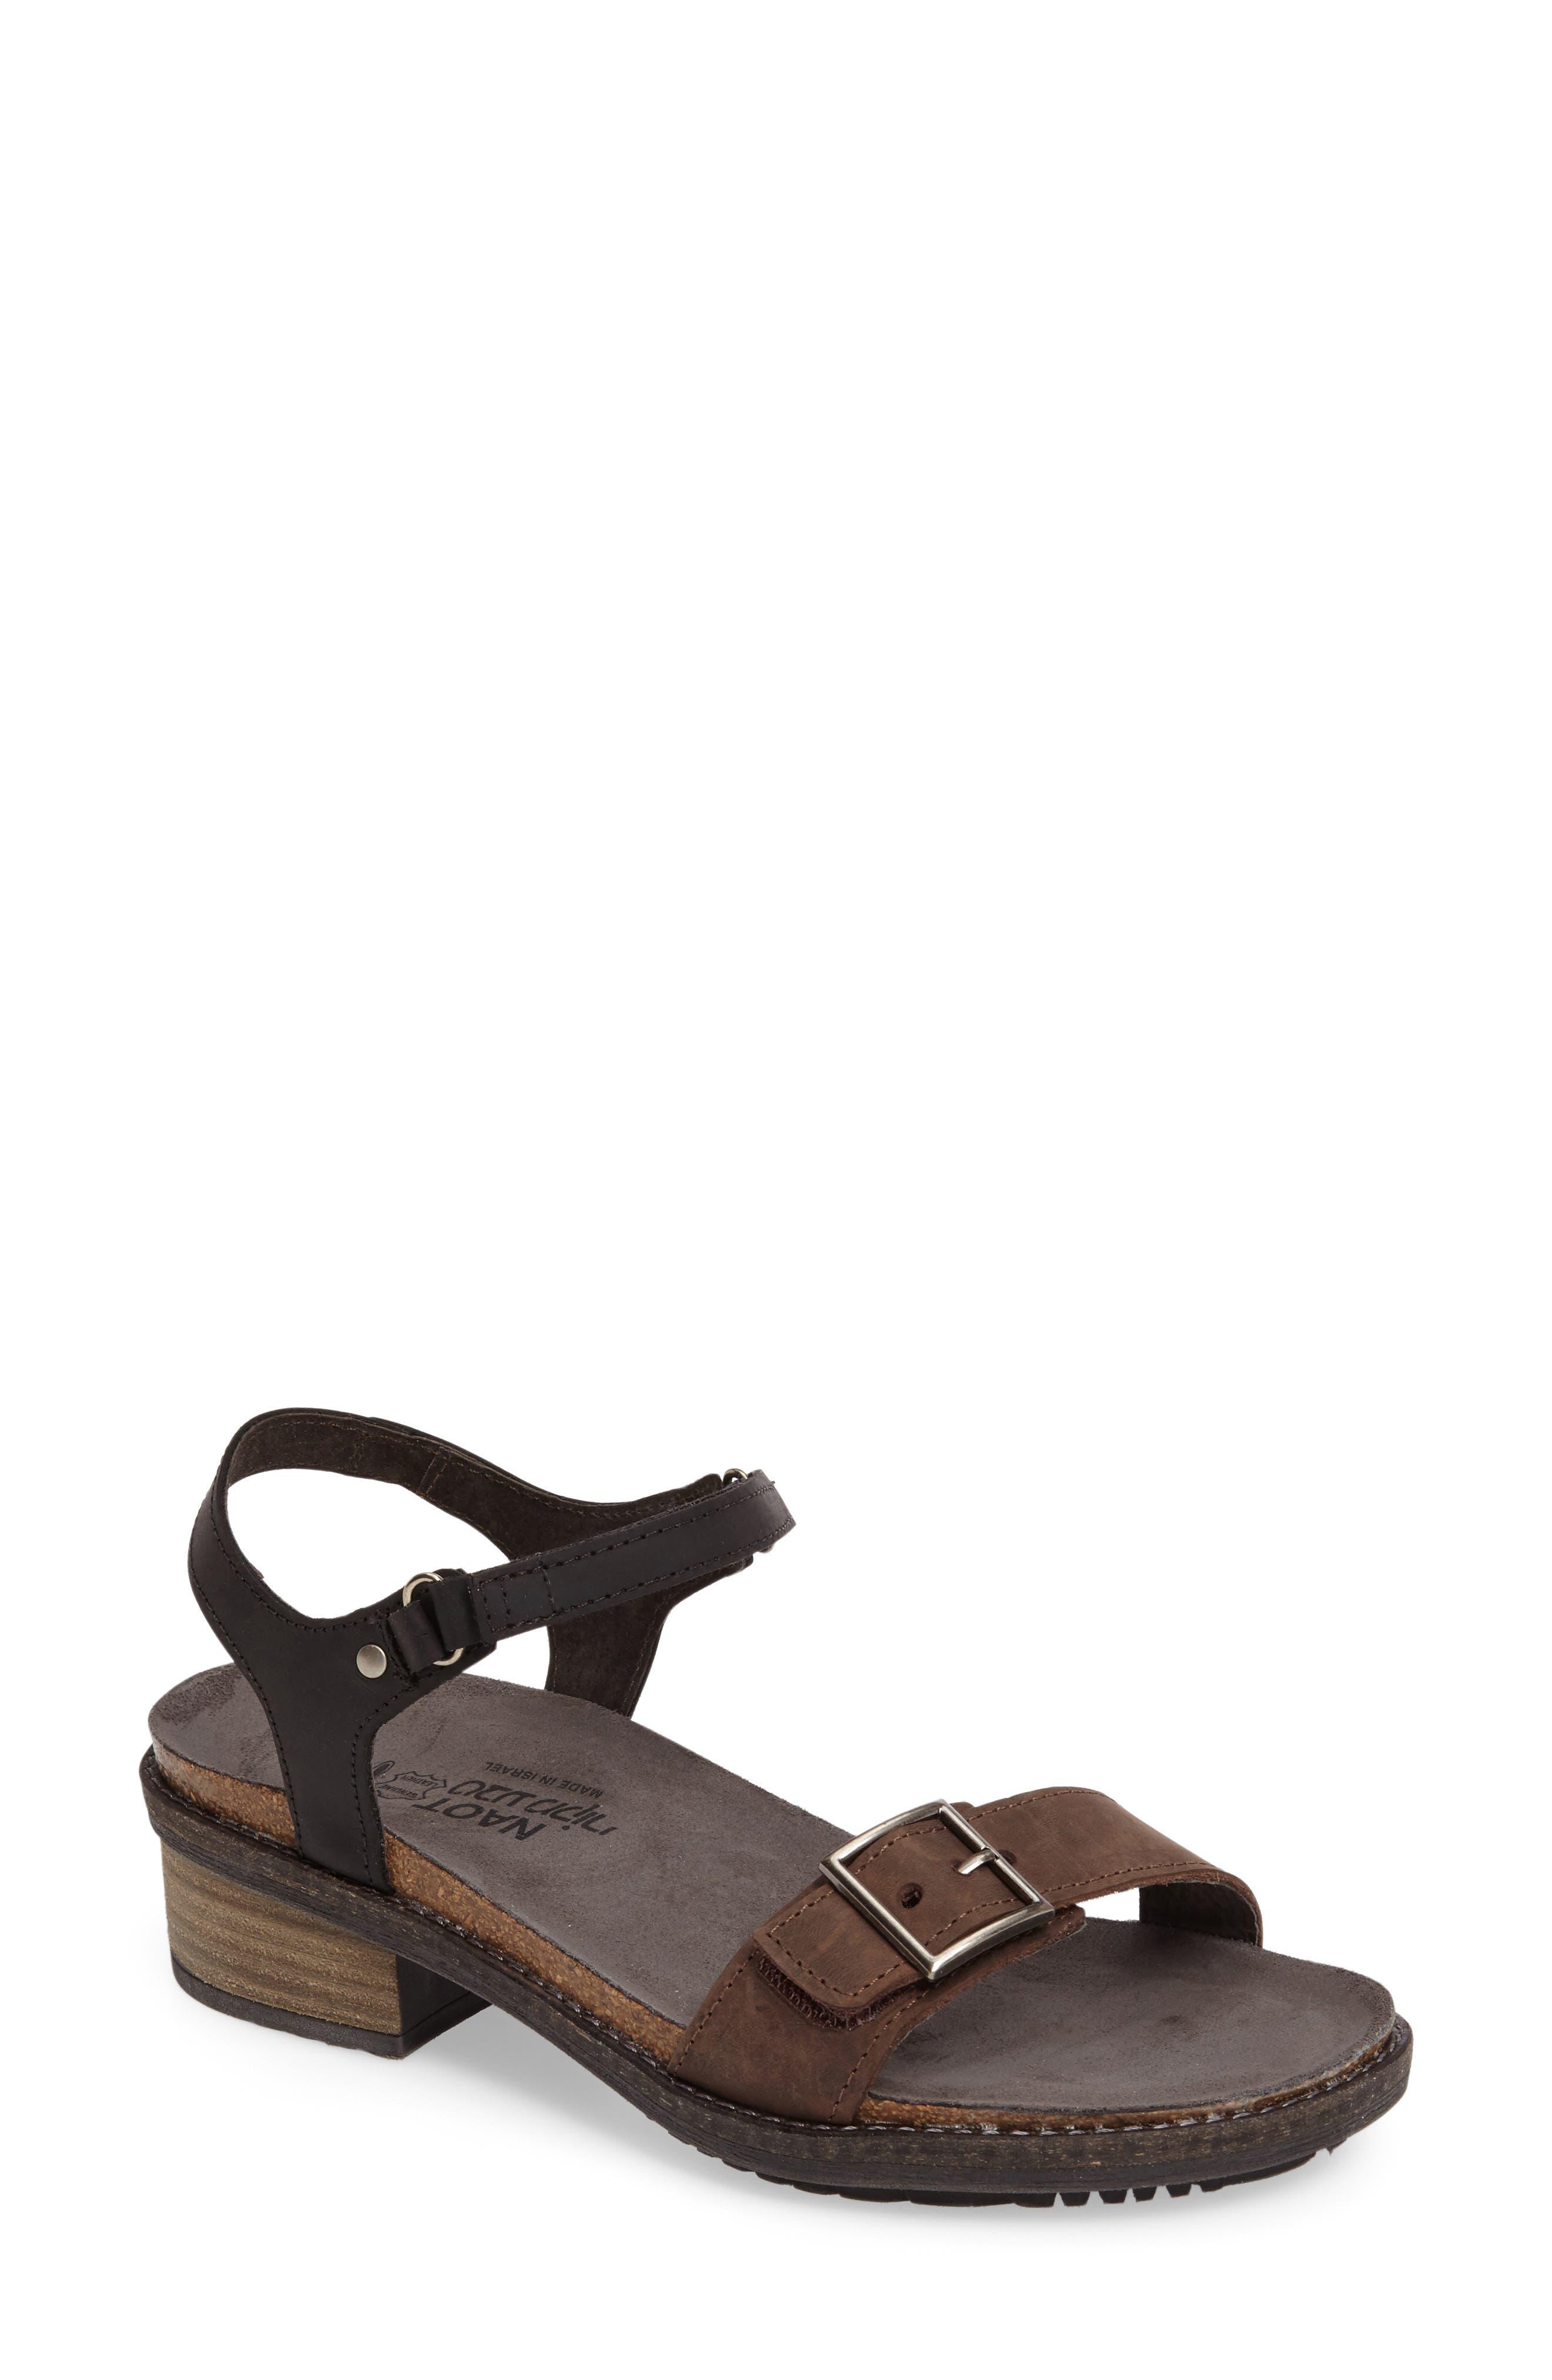 Boho Sandal,                         Main,                         color, BROWN/ BLACK LEATHER